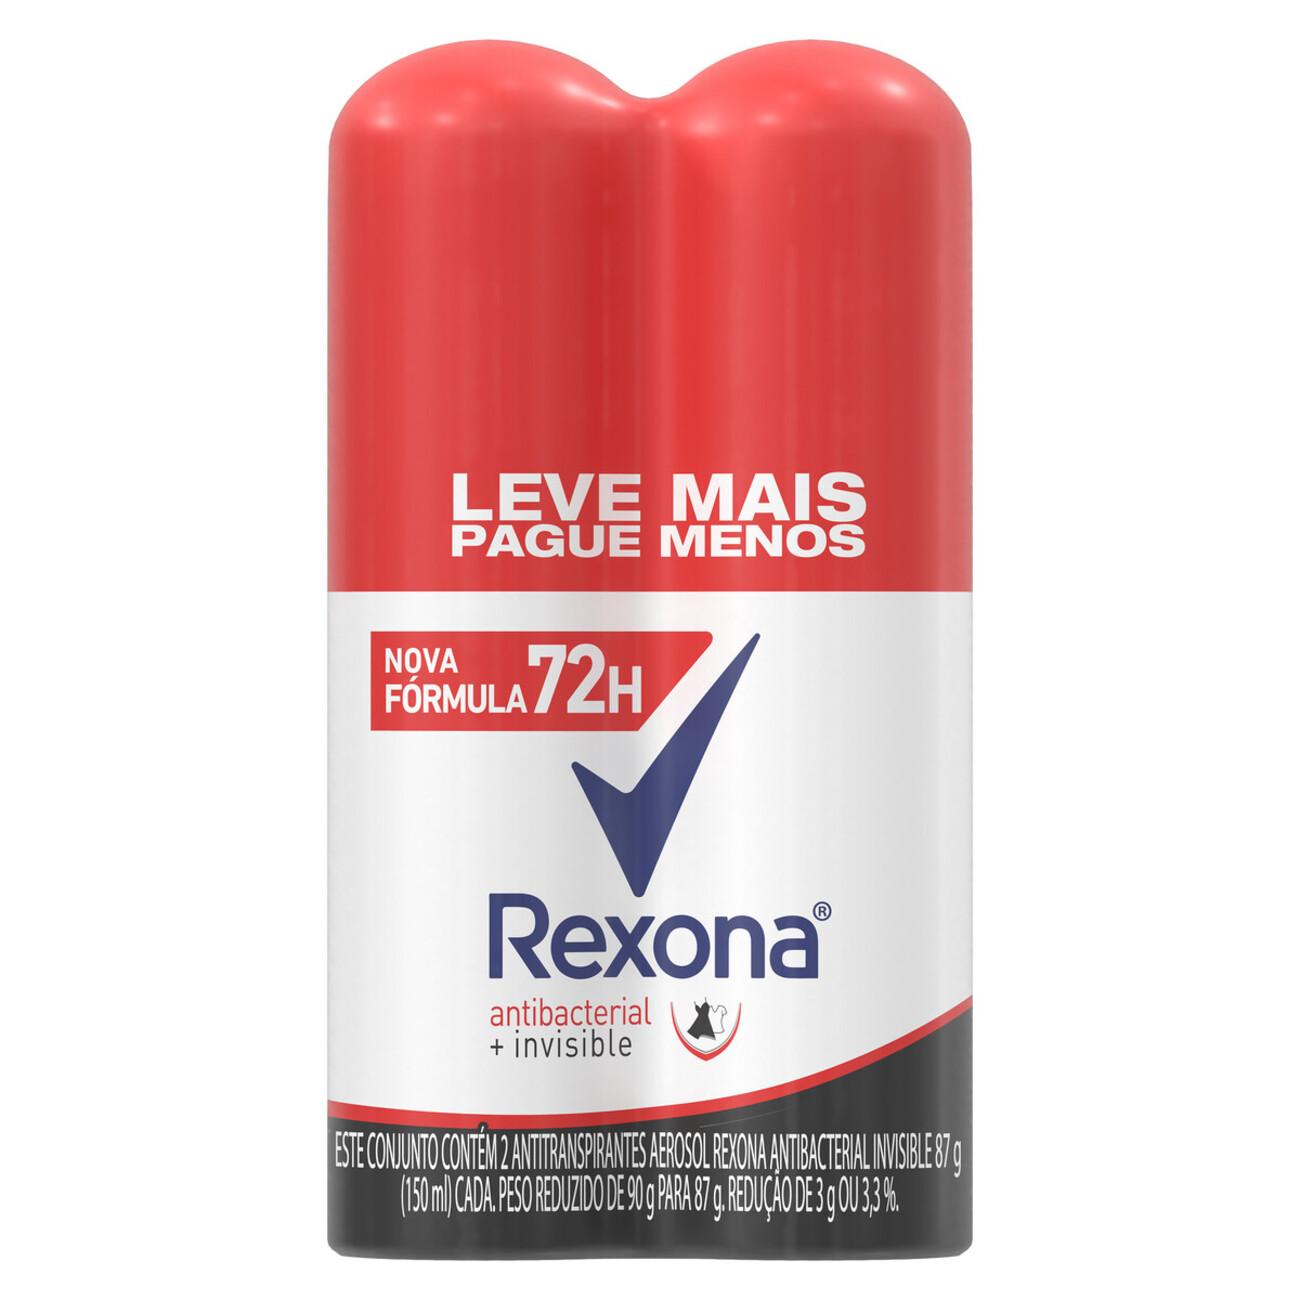 Oferta 2 Desodorantes Antitranspirante Aerosol Rexona Antibacterial + Invisible 72 horas 150mL